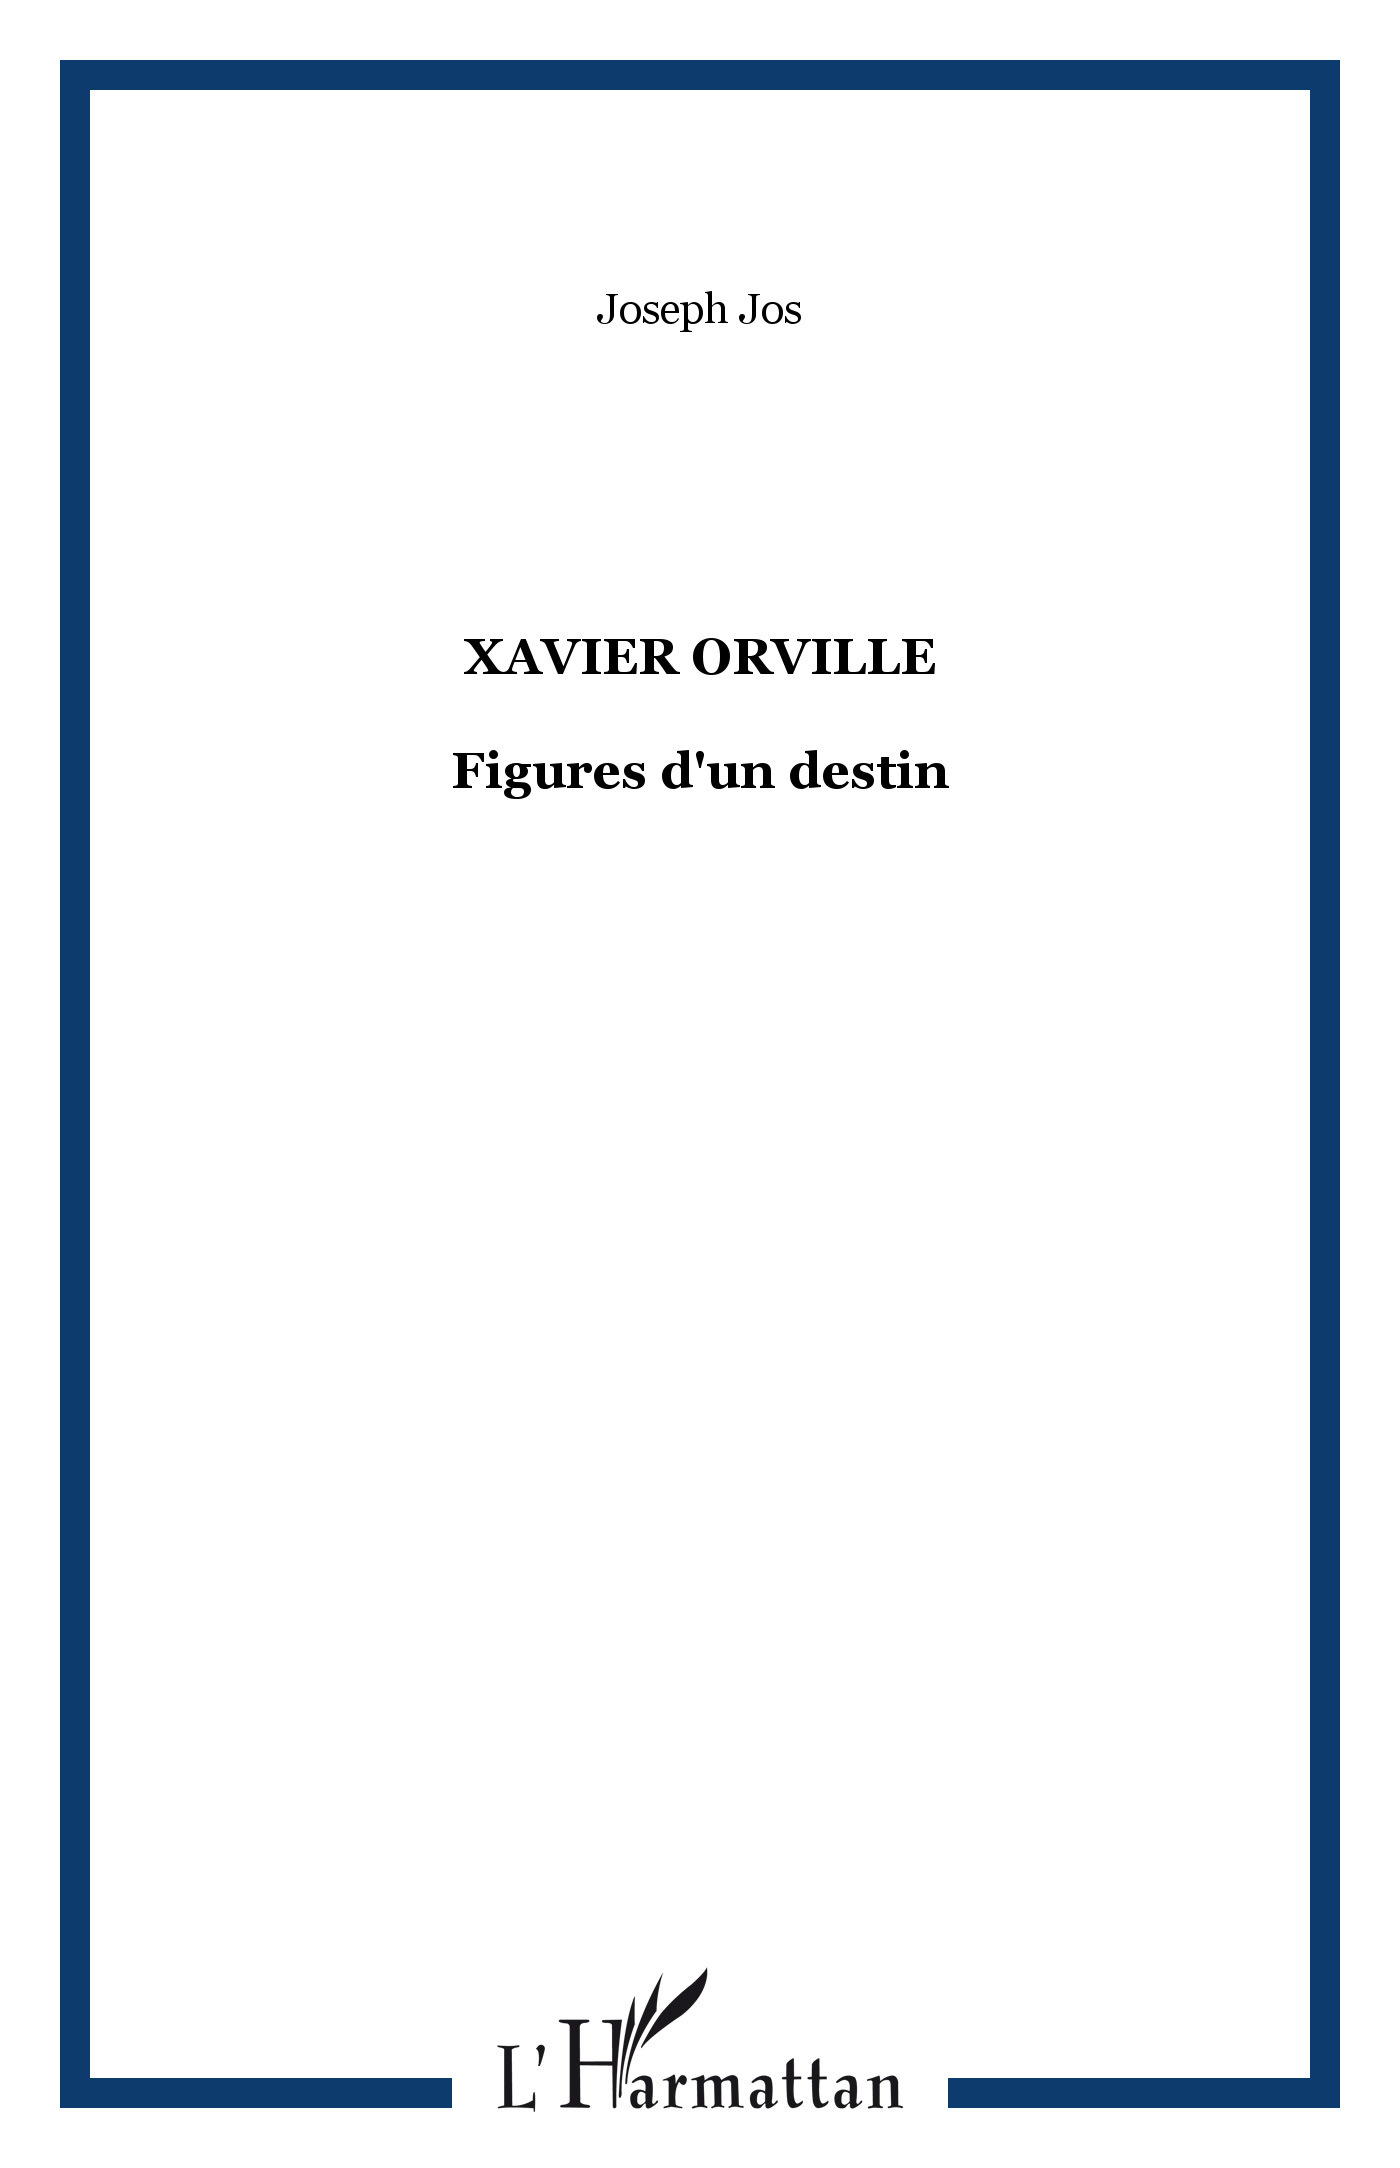 XAVIER ORVILLE FIGURES D'UN DESTIN